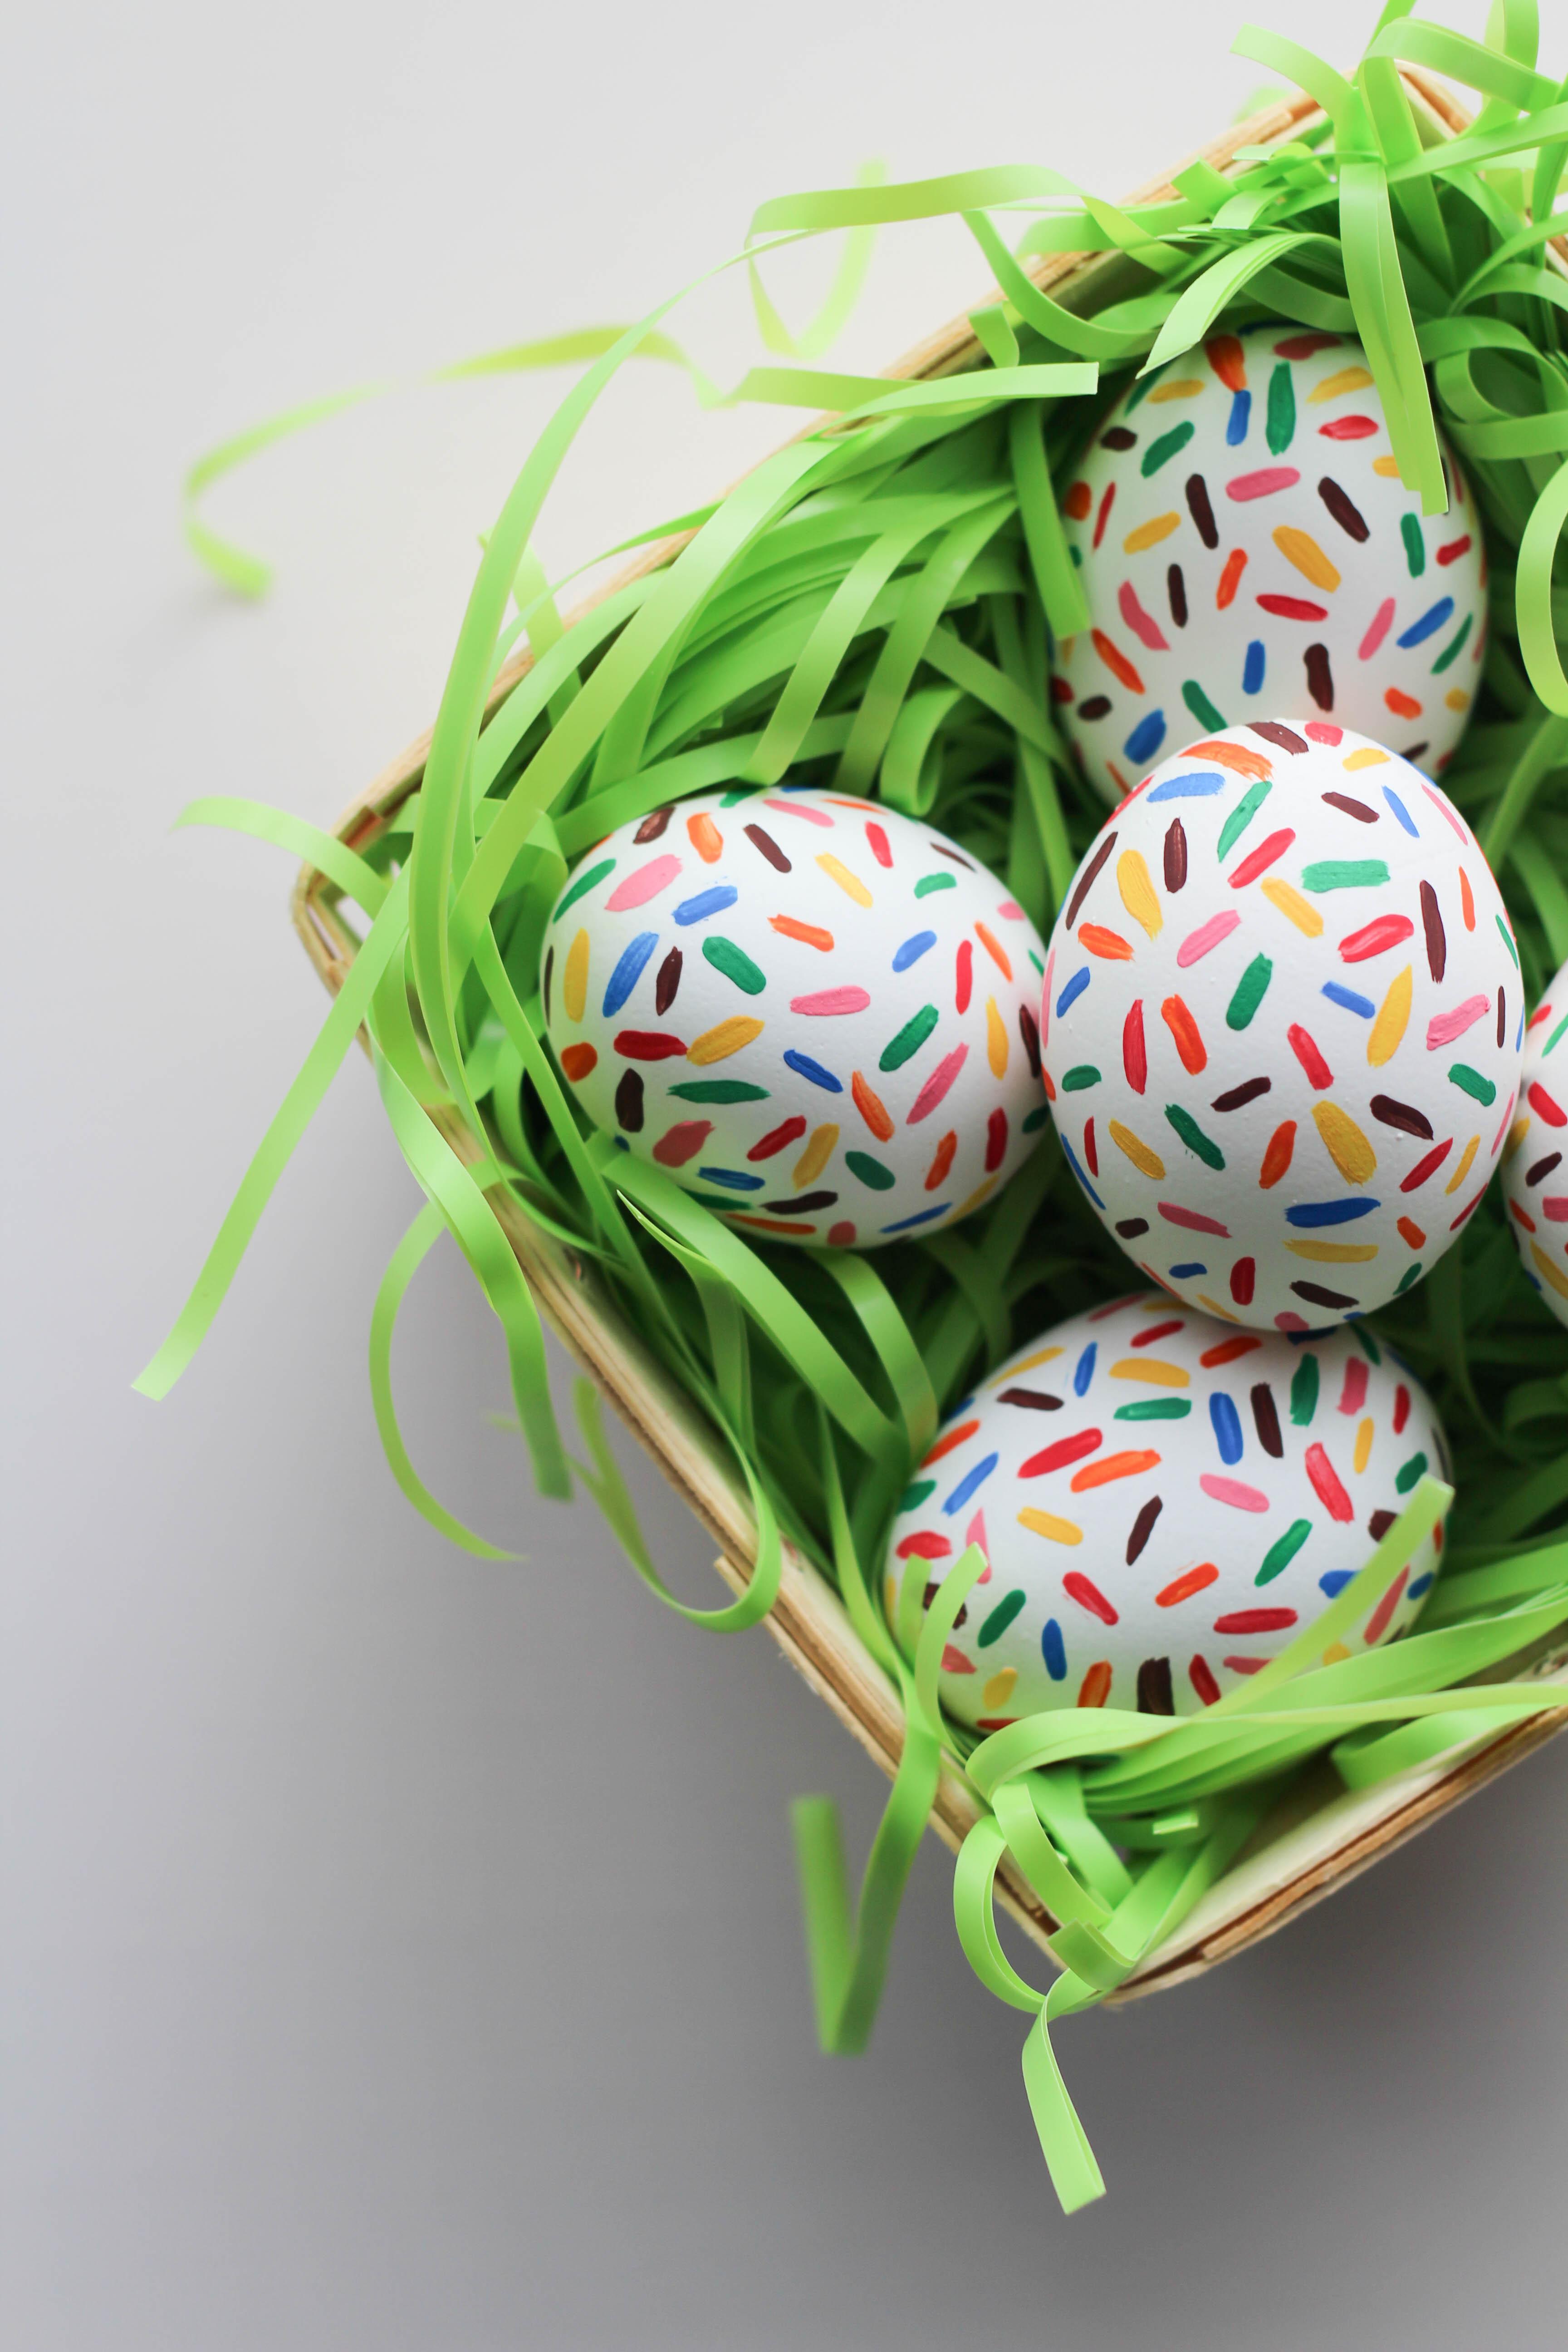 Diy Sprinkle Easter Eggs Let S Mingle Blog